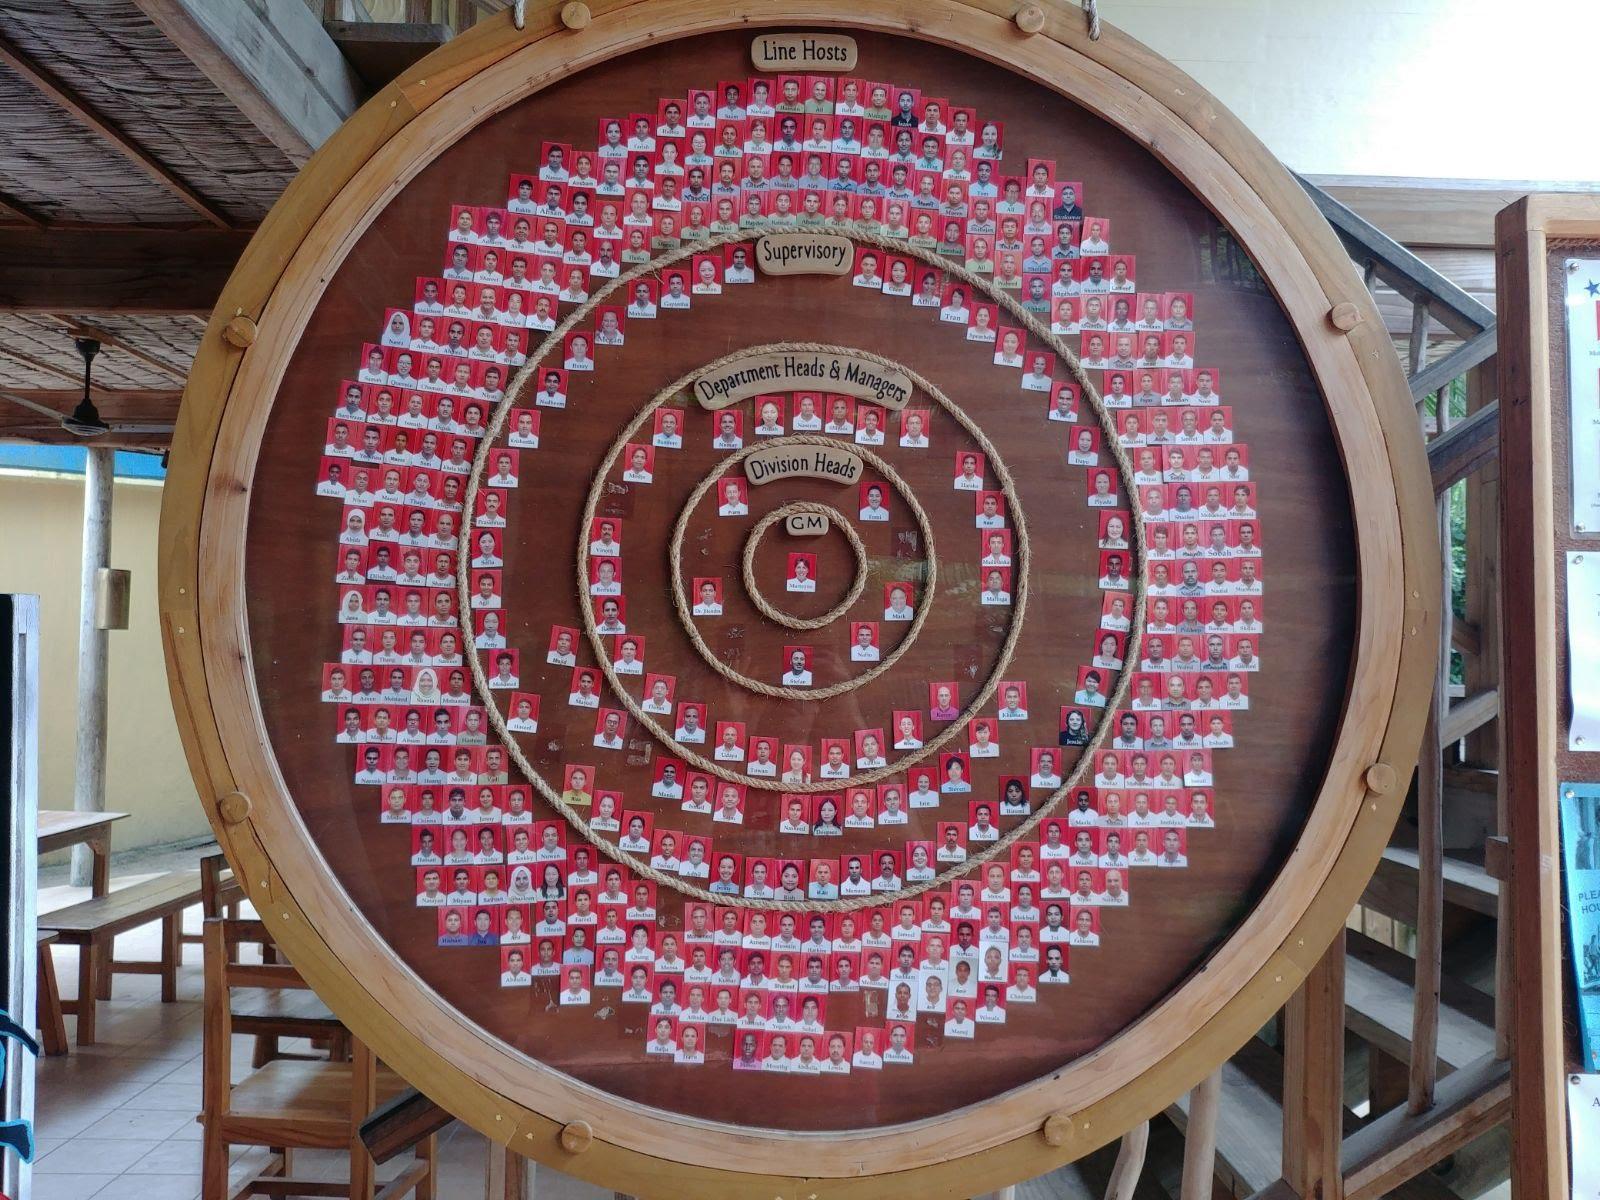 The wheel of staff members